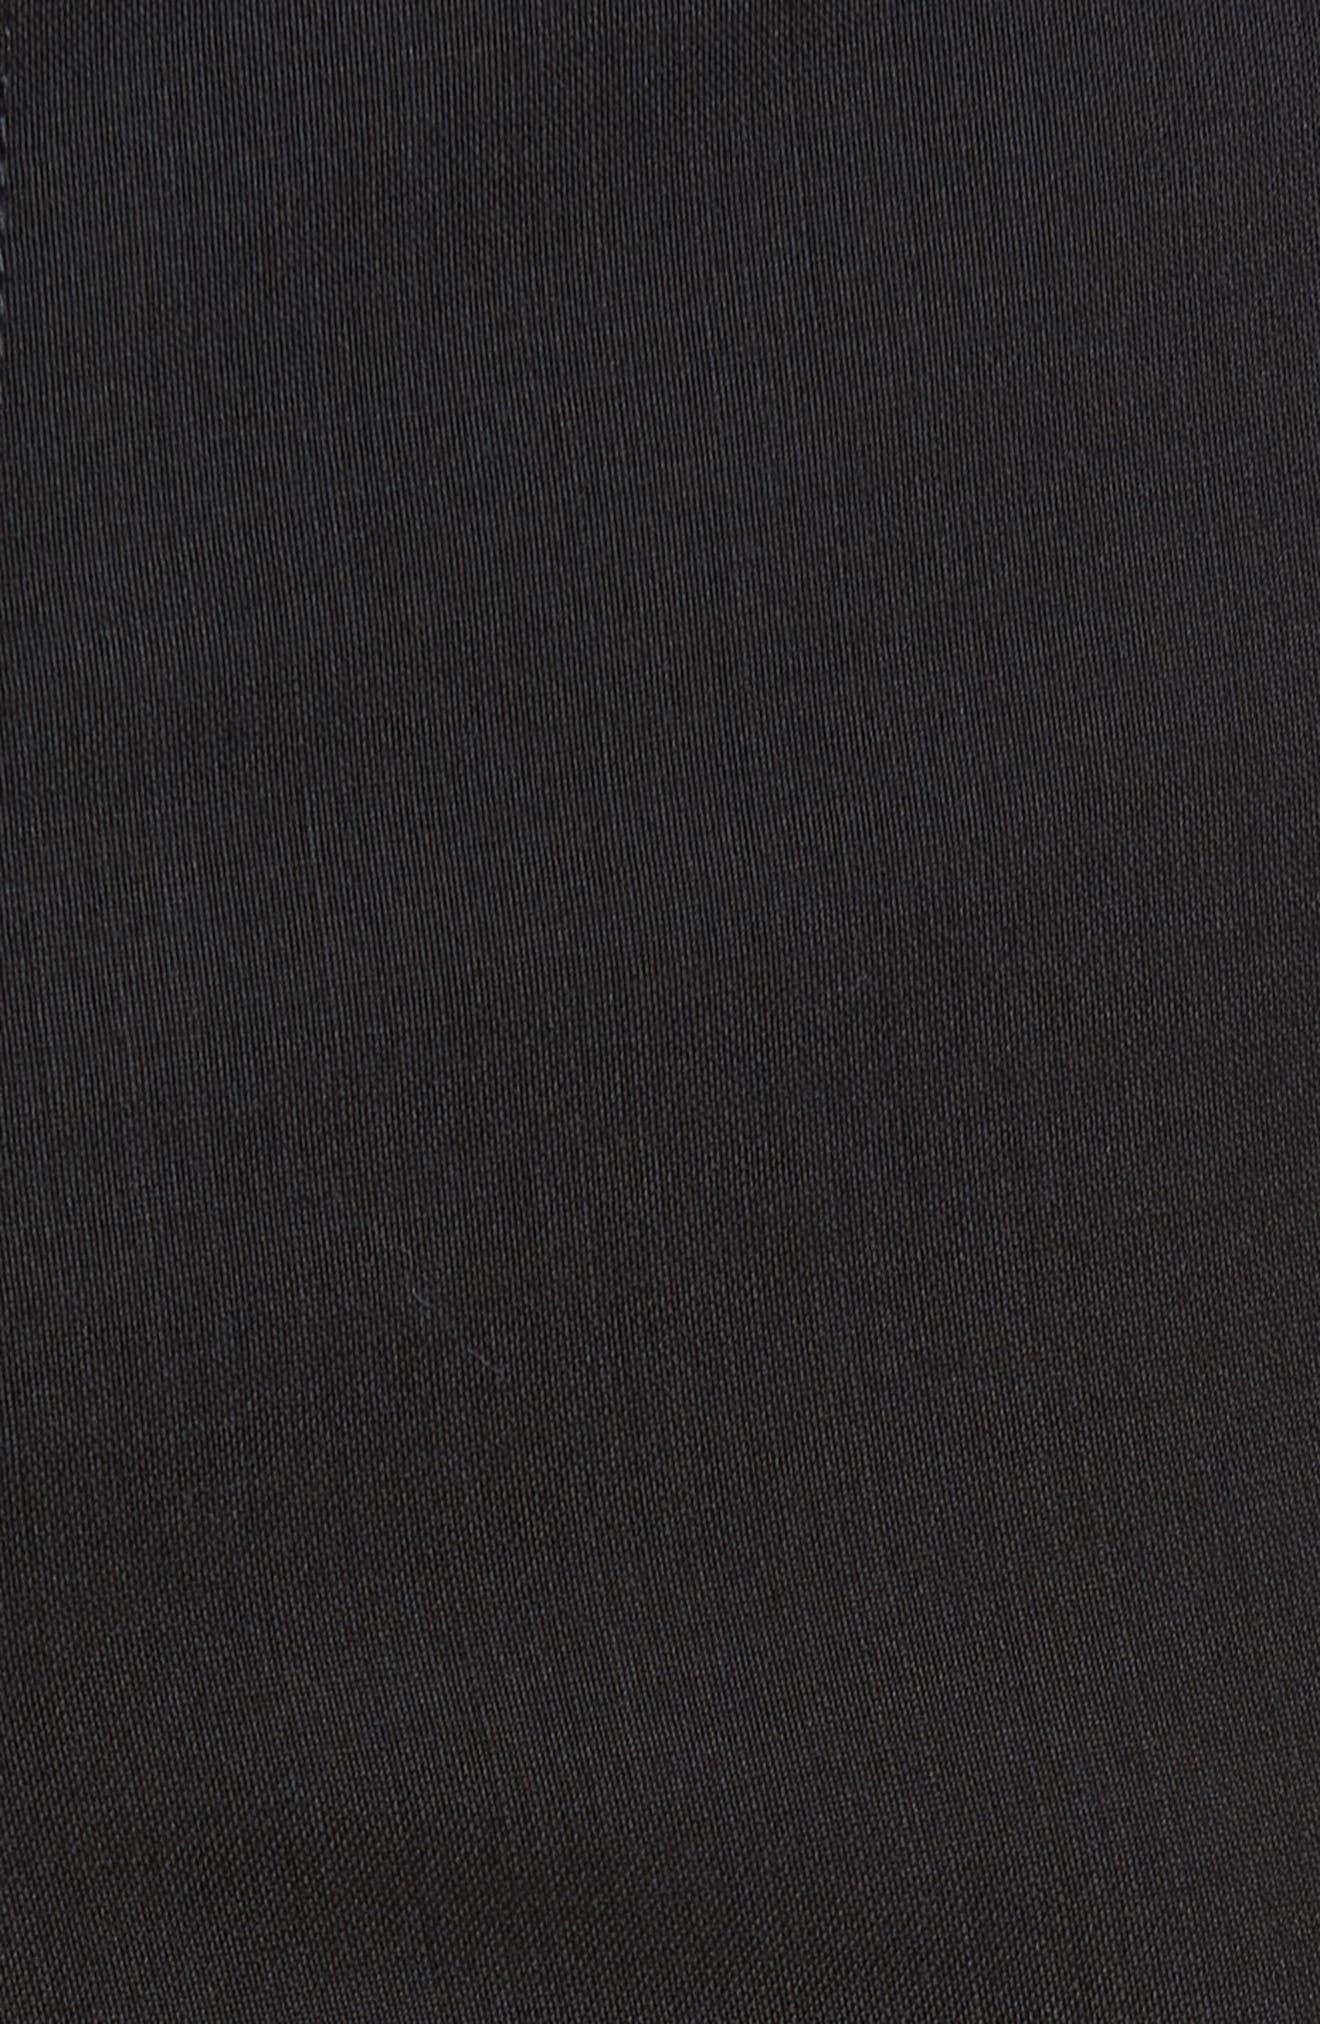 Alternate Image 2  - BOSS 'Genesis' Flat Front Wool Trousers